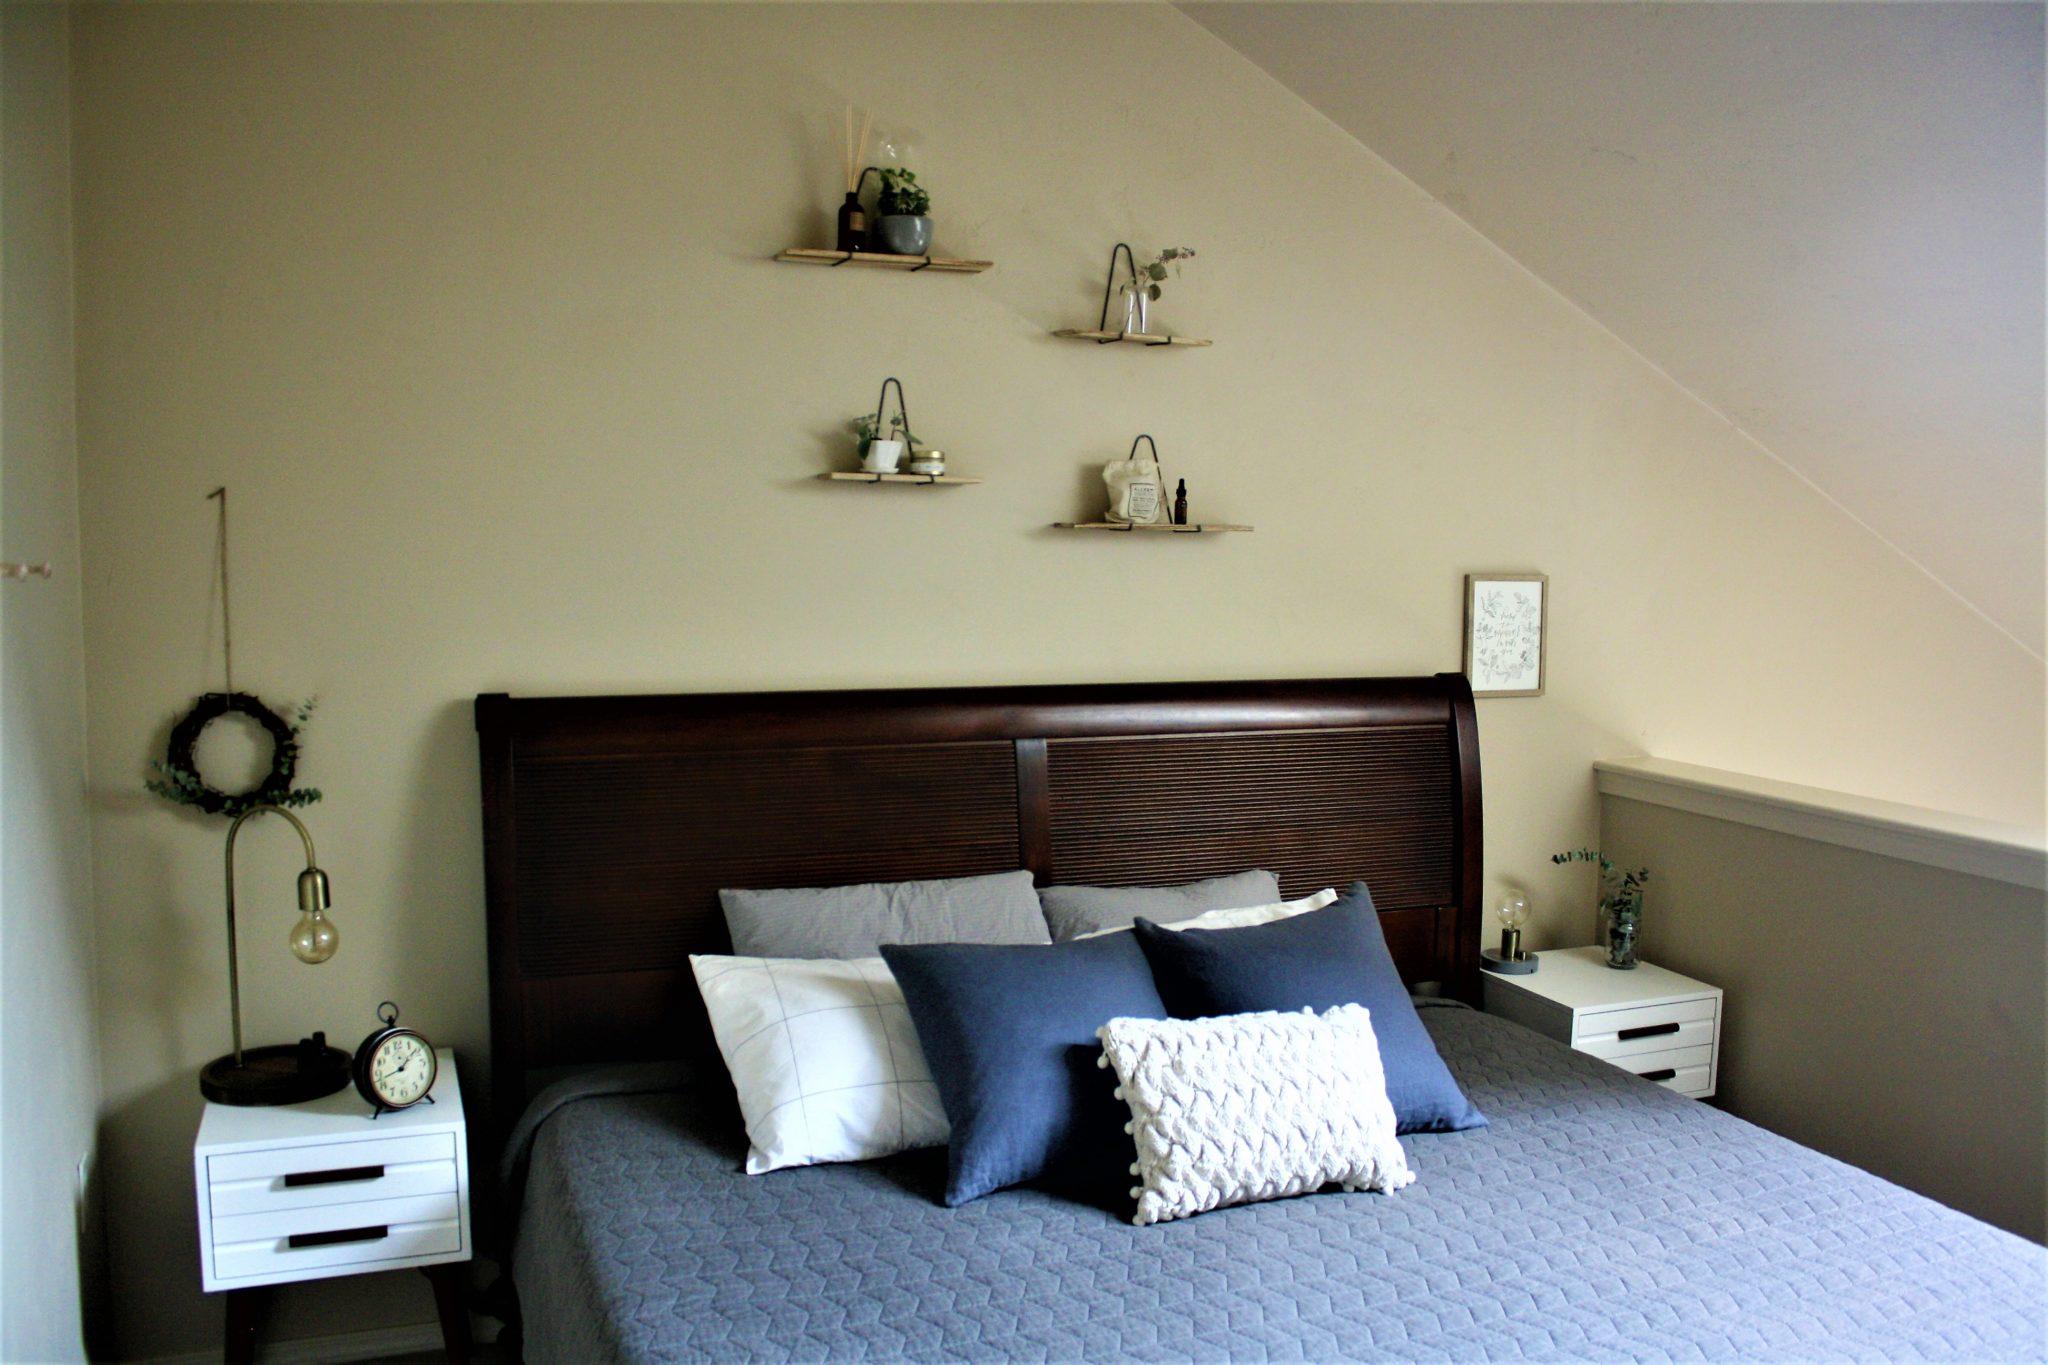 Gorgeous & Unique Lofted Bedroom